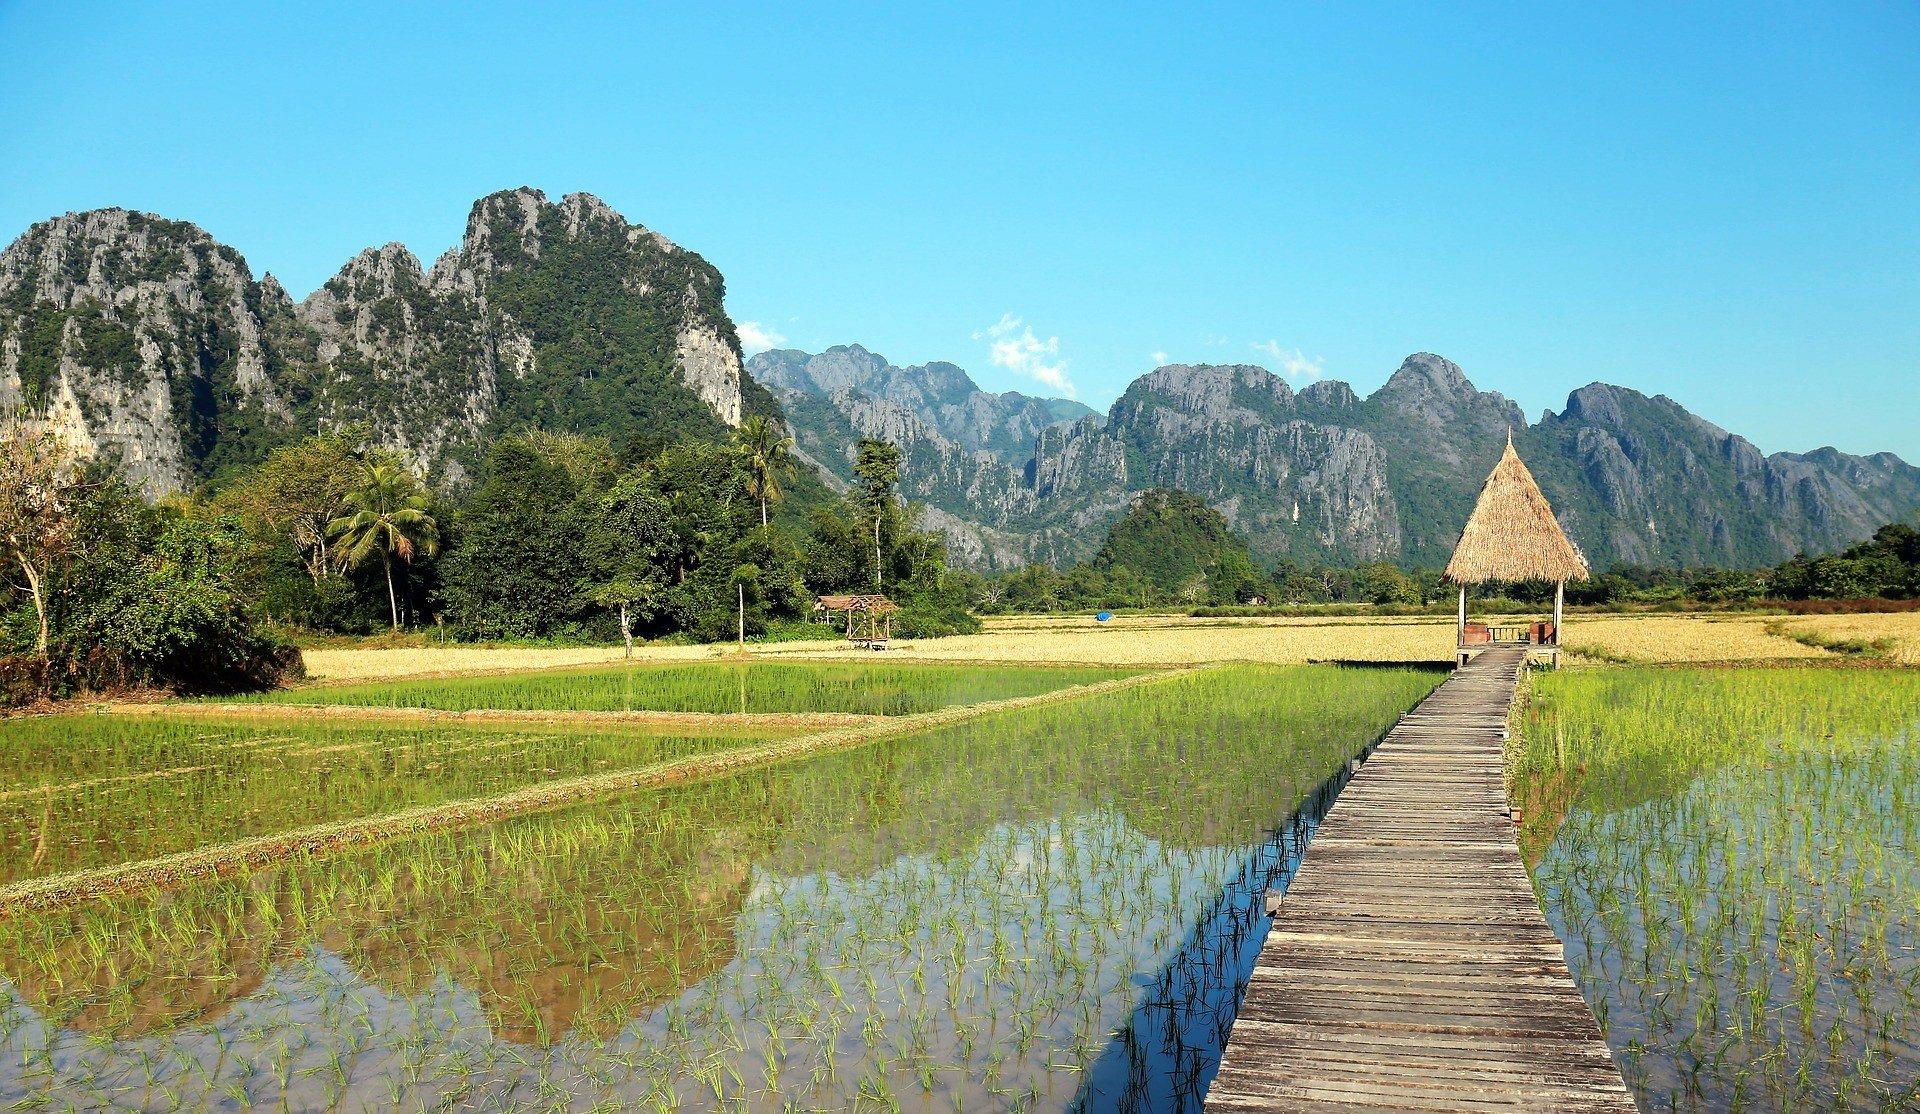 Rice fields in Vang Vieng, Laos